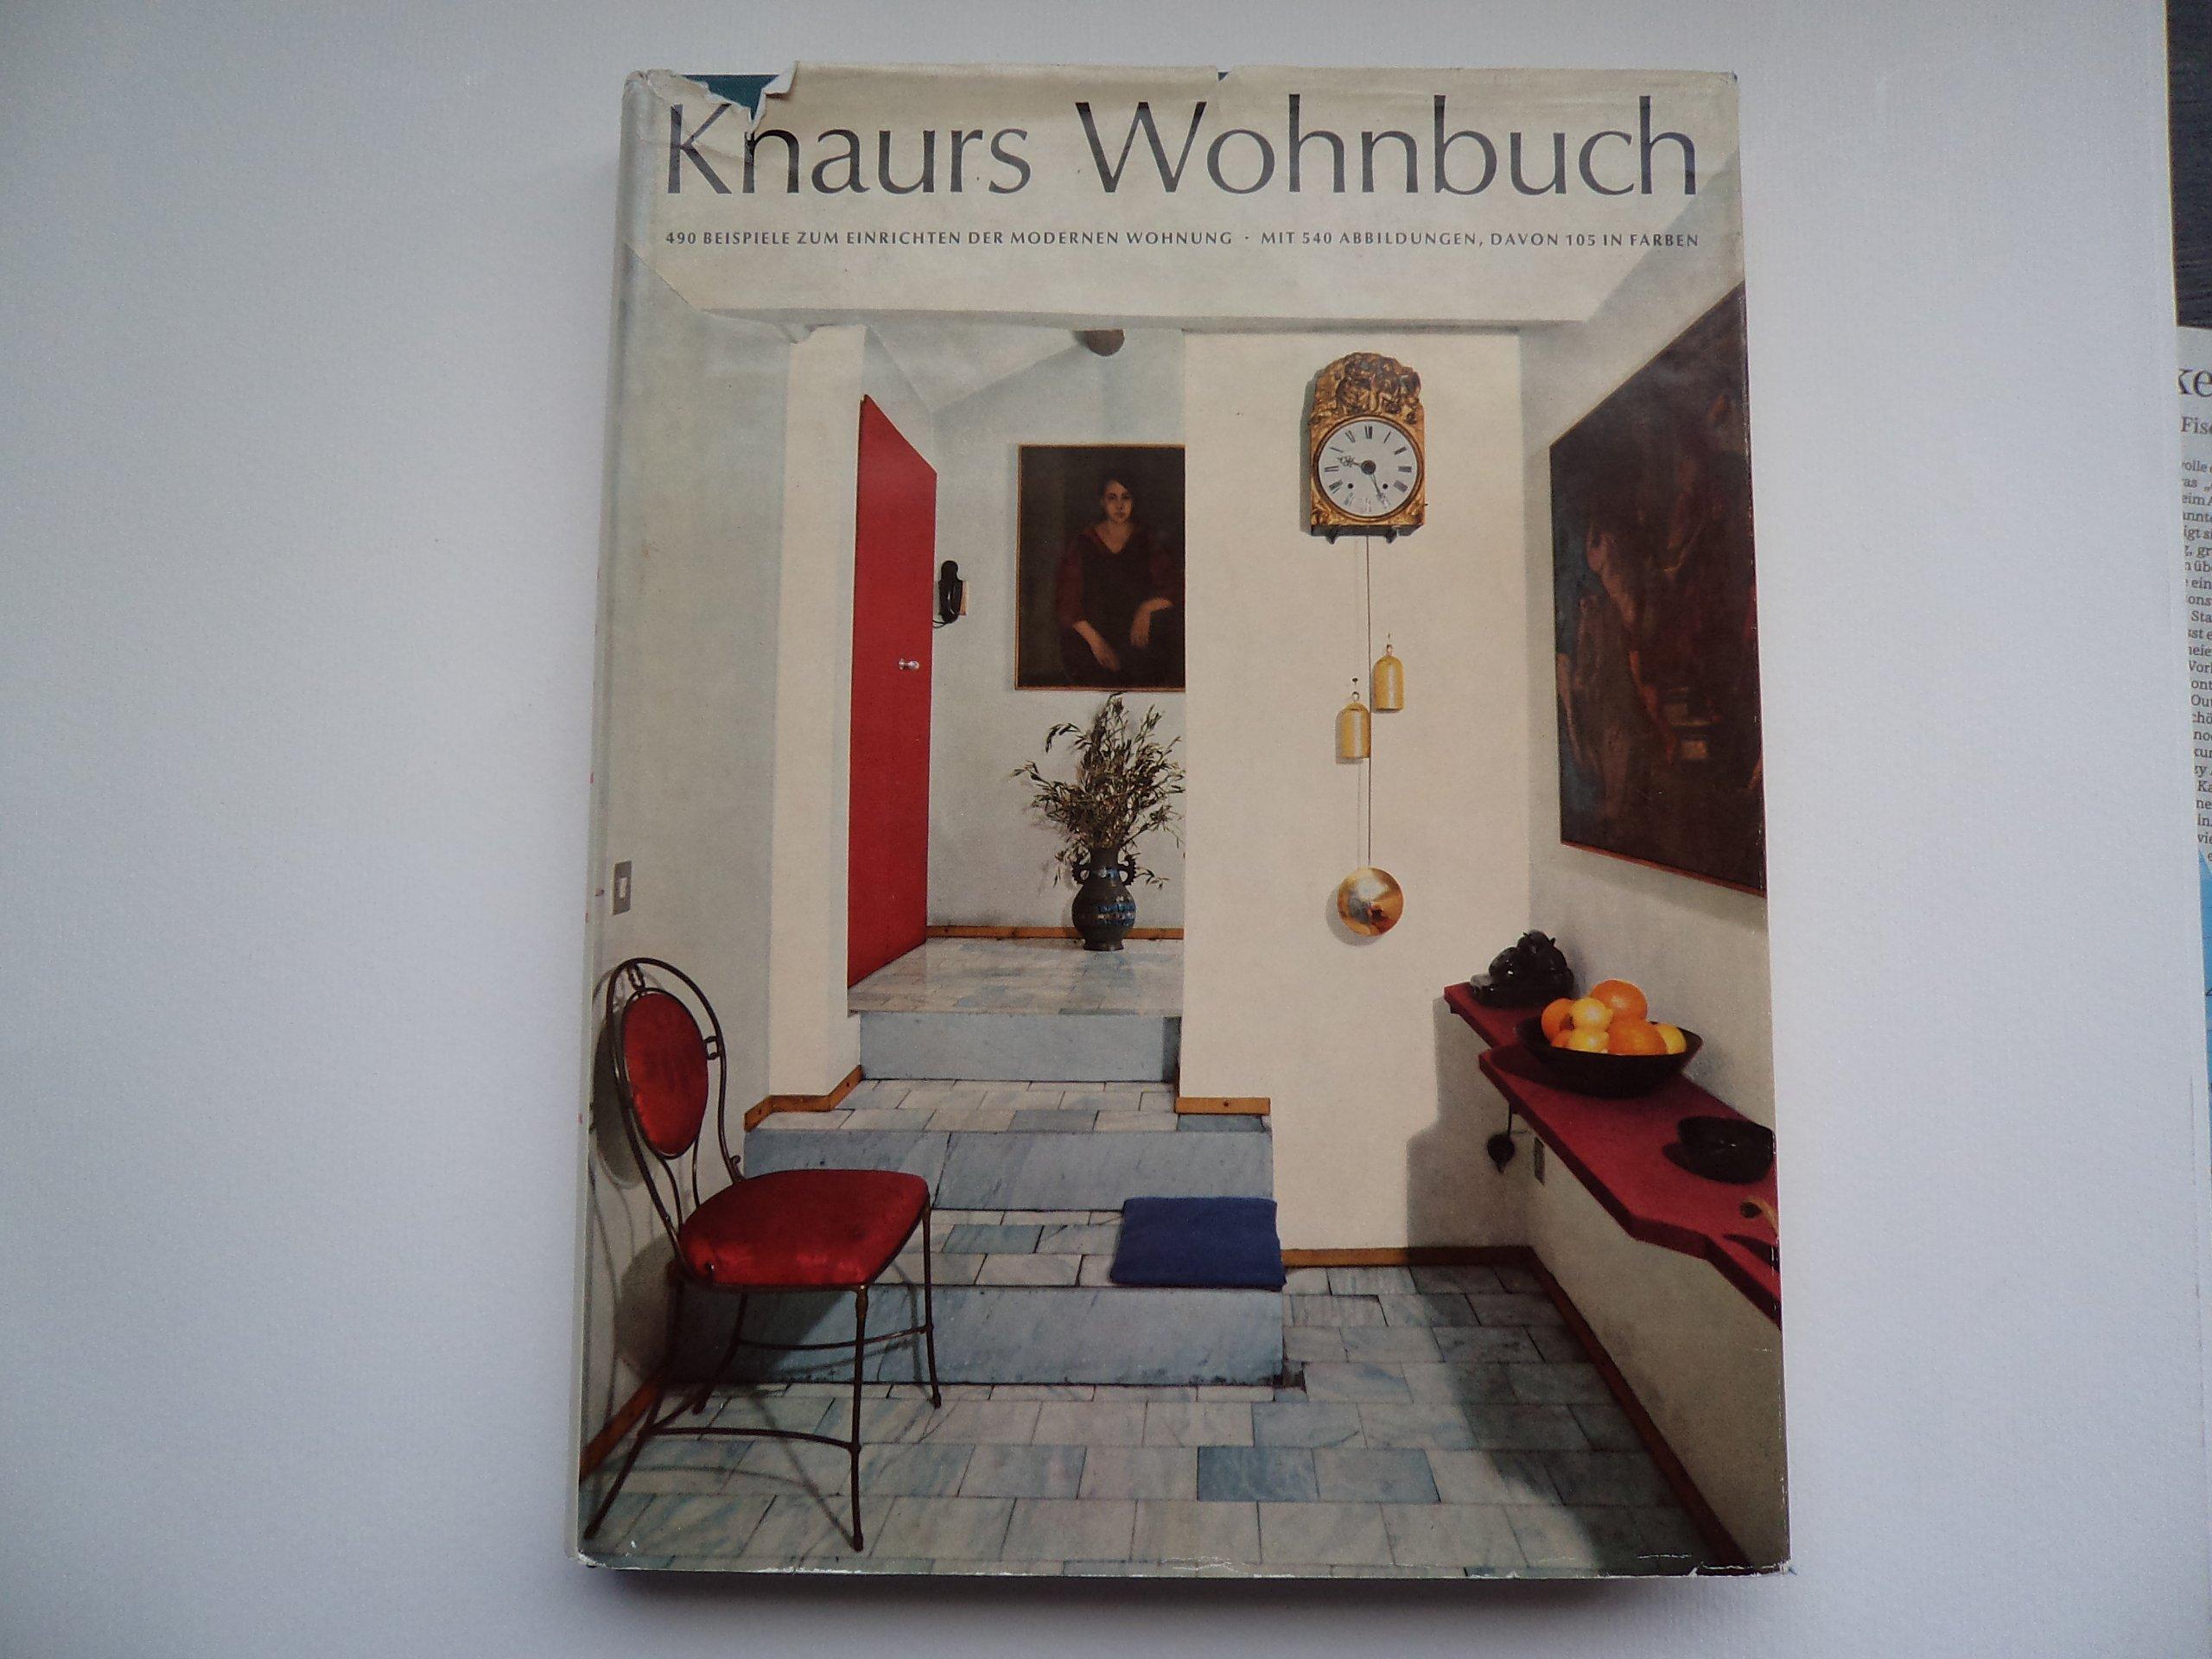 Knaurs Wohnbuch: Amazon.com: Books